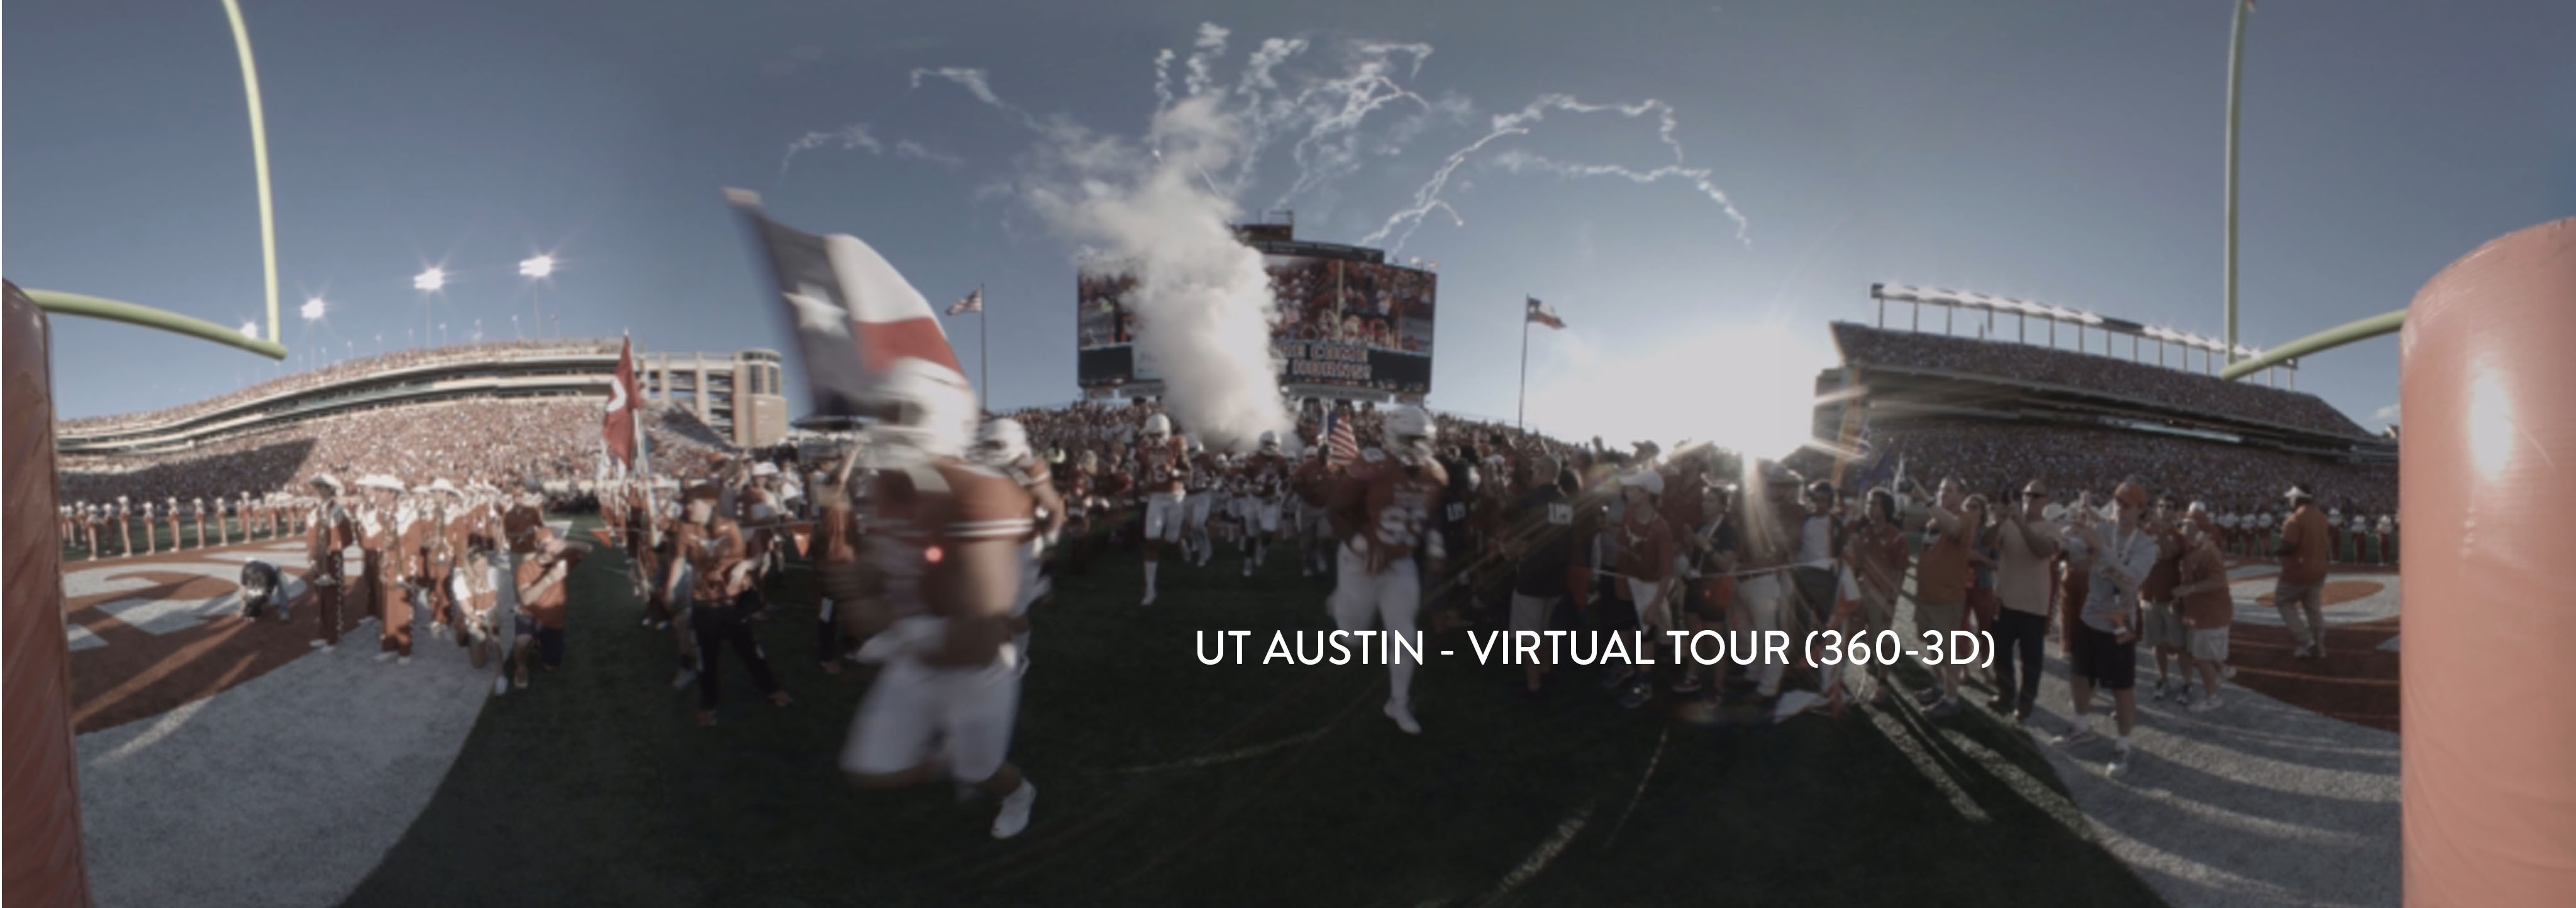 DQ_Splash__0000_UT AUSTIN - VIRTUAL TOUR (360-3D)